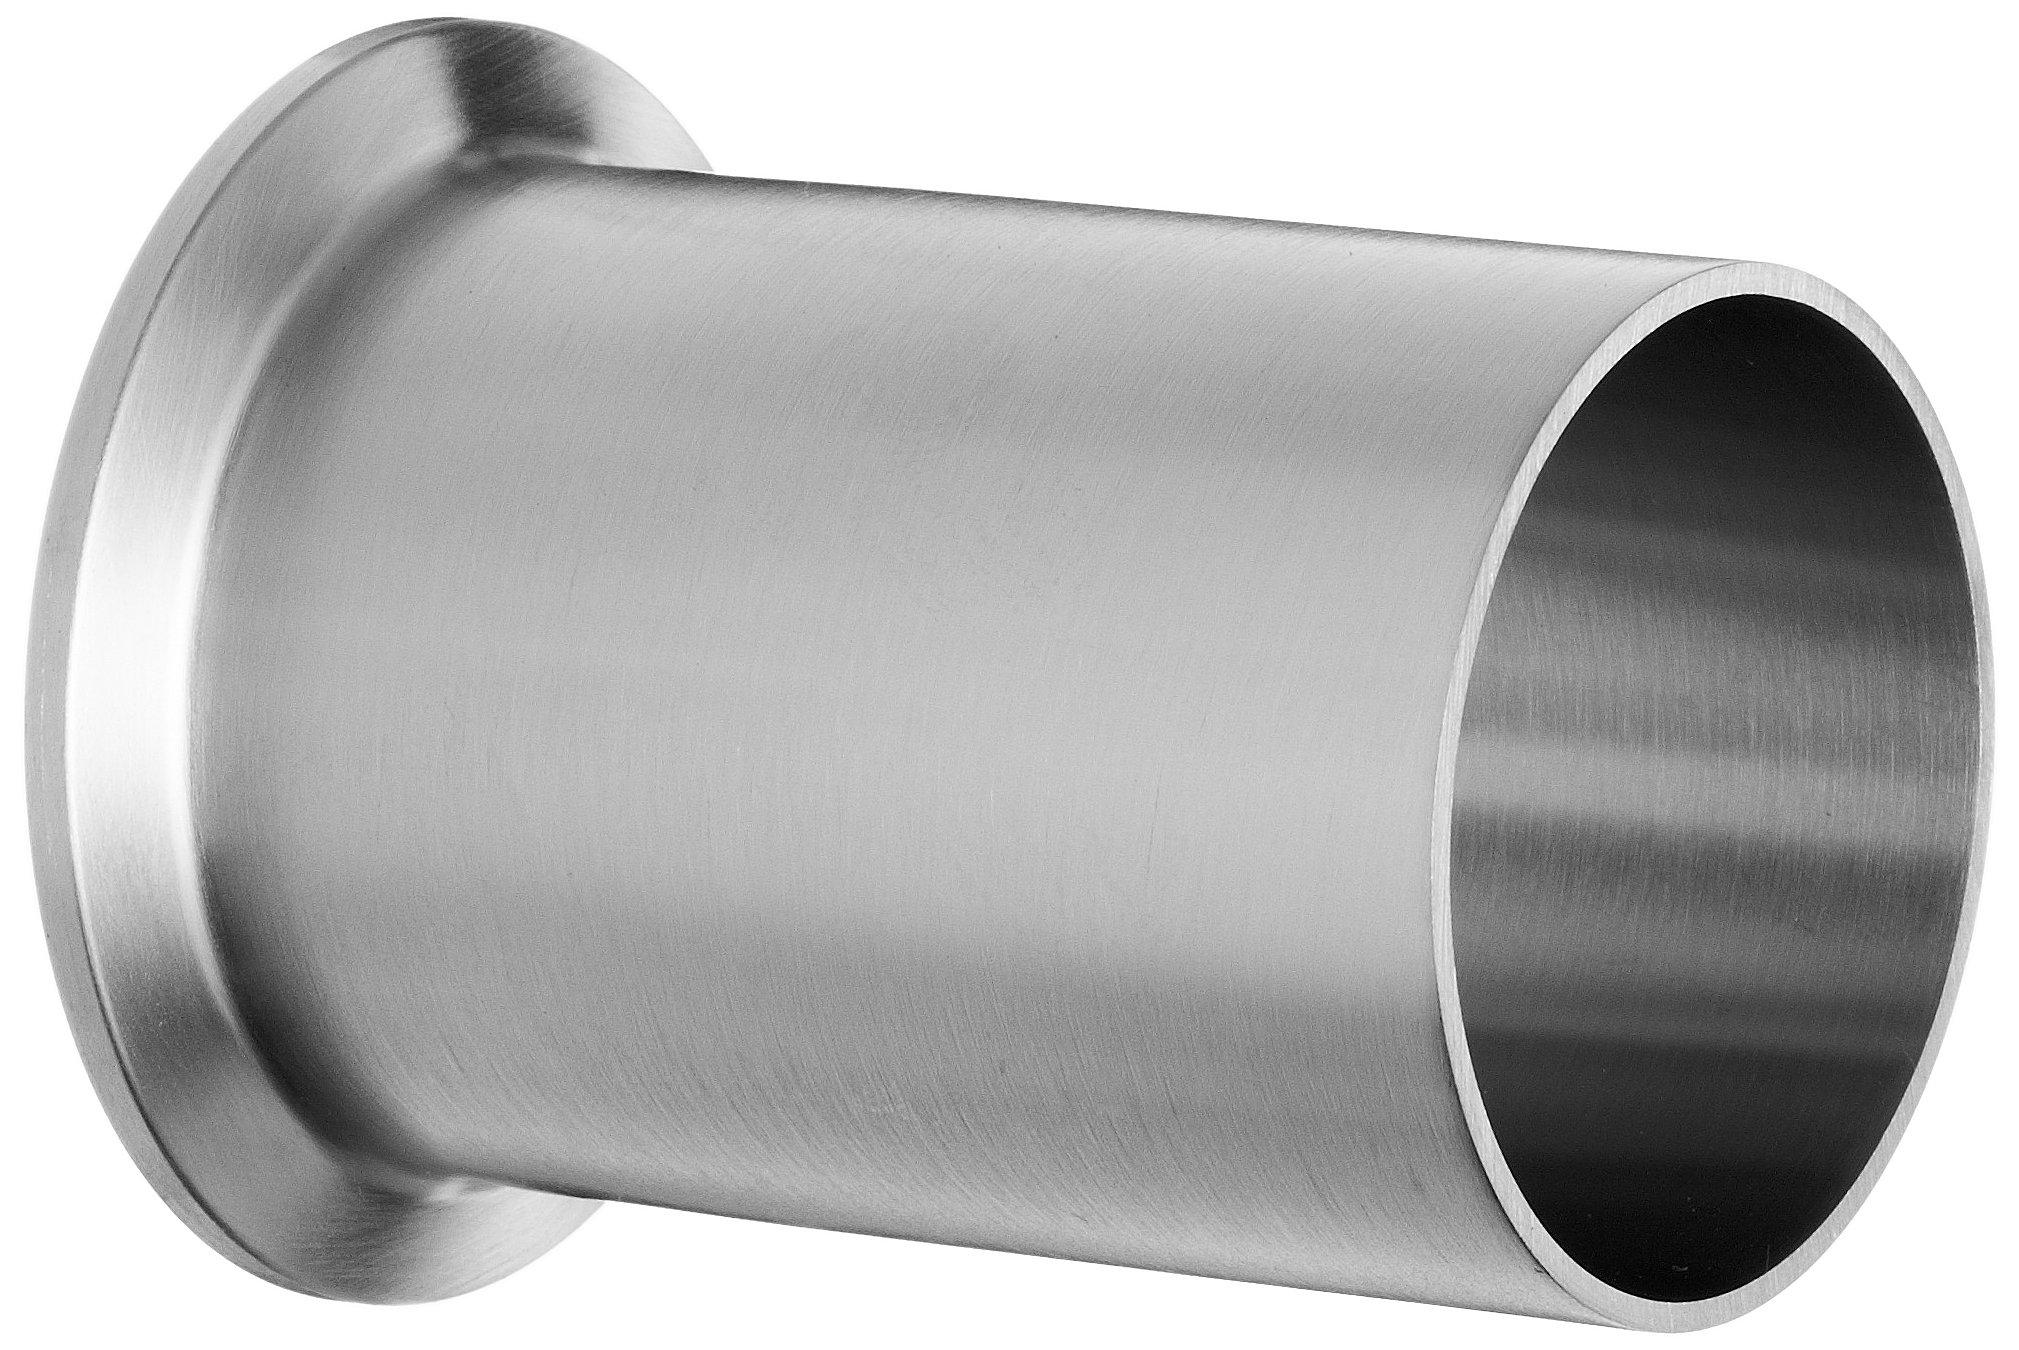 Dixon 14WLMP-R200 Stainless Steel 316L Sanitary Fitting, Light Duty Tank Weld Clamp Ferrule, 2'' Tube OD